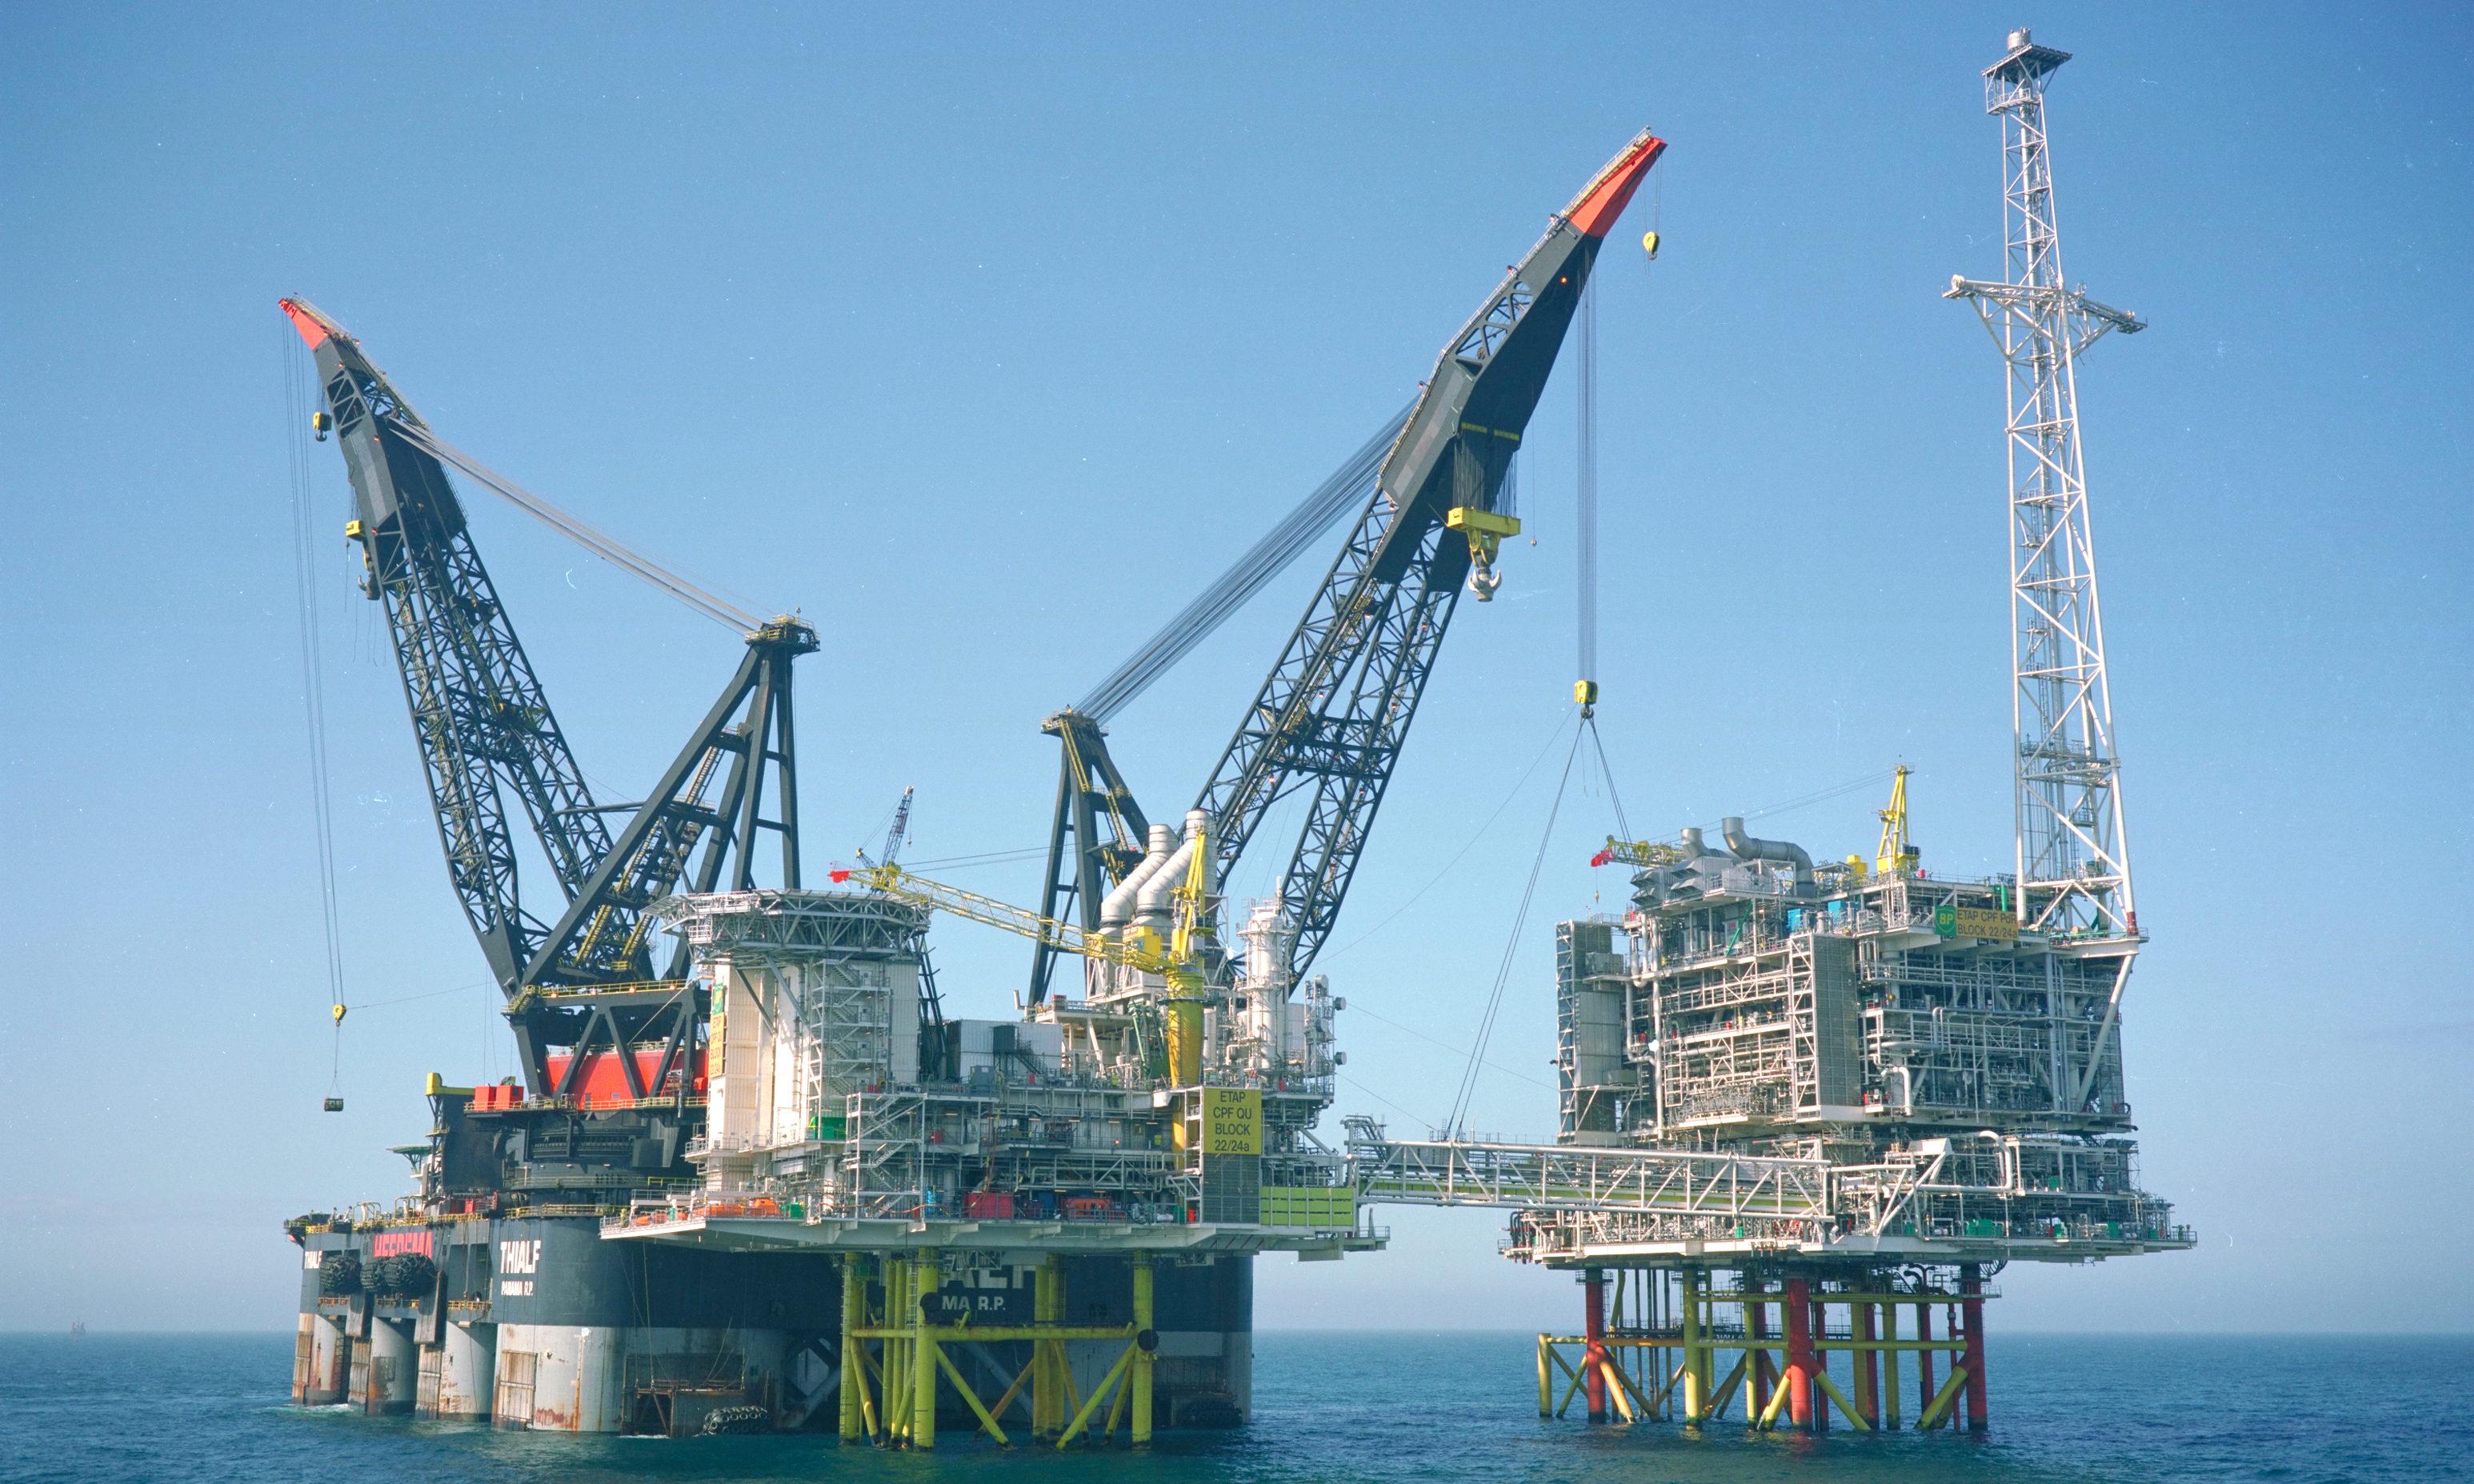 BP's ETAP platform